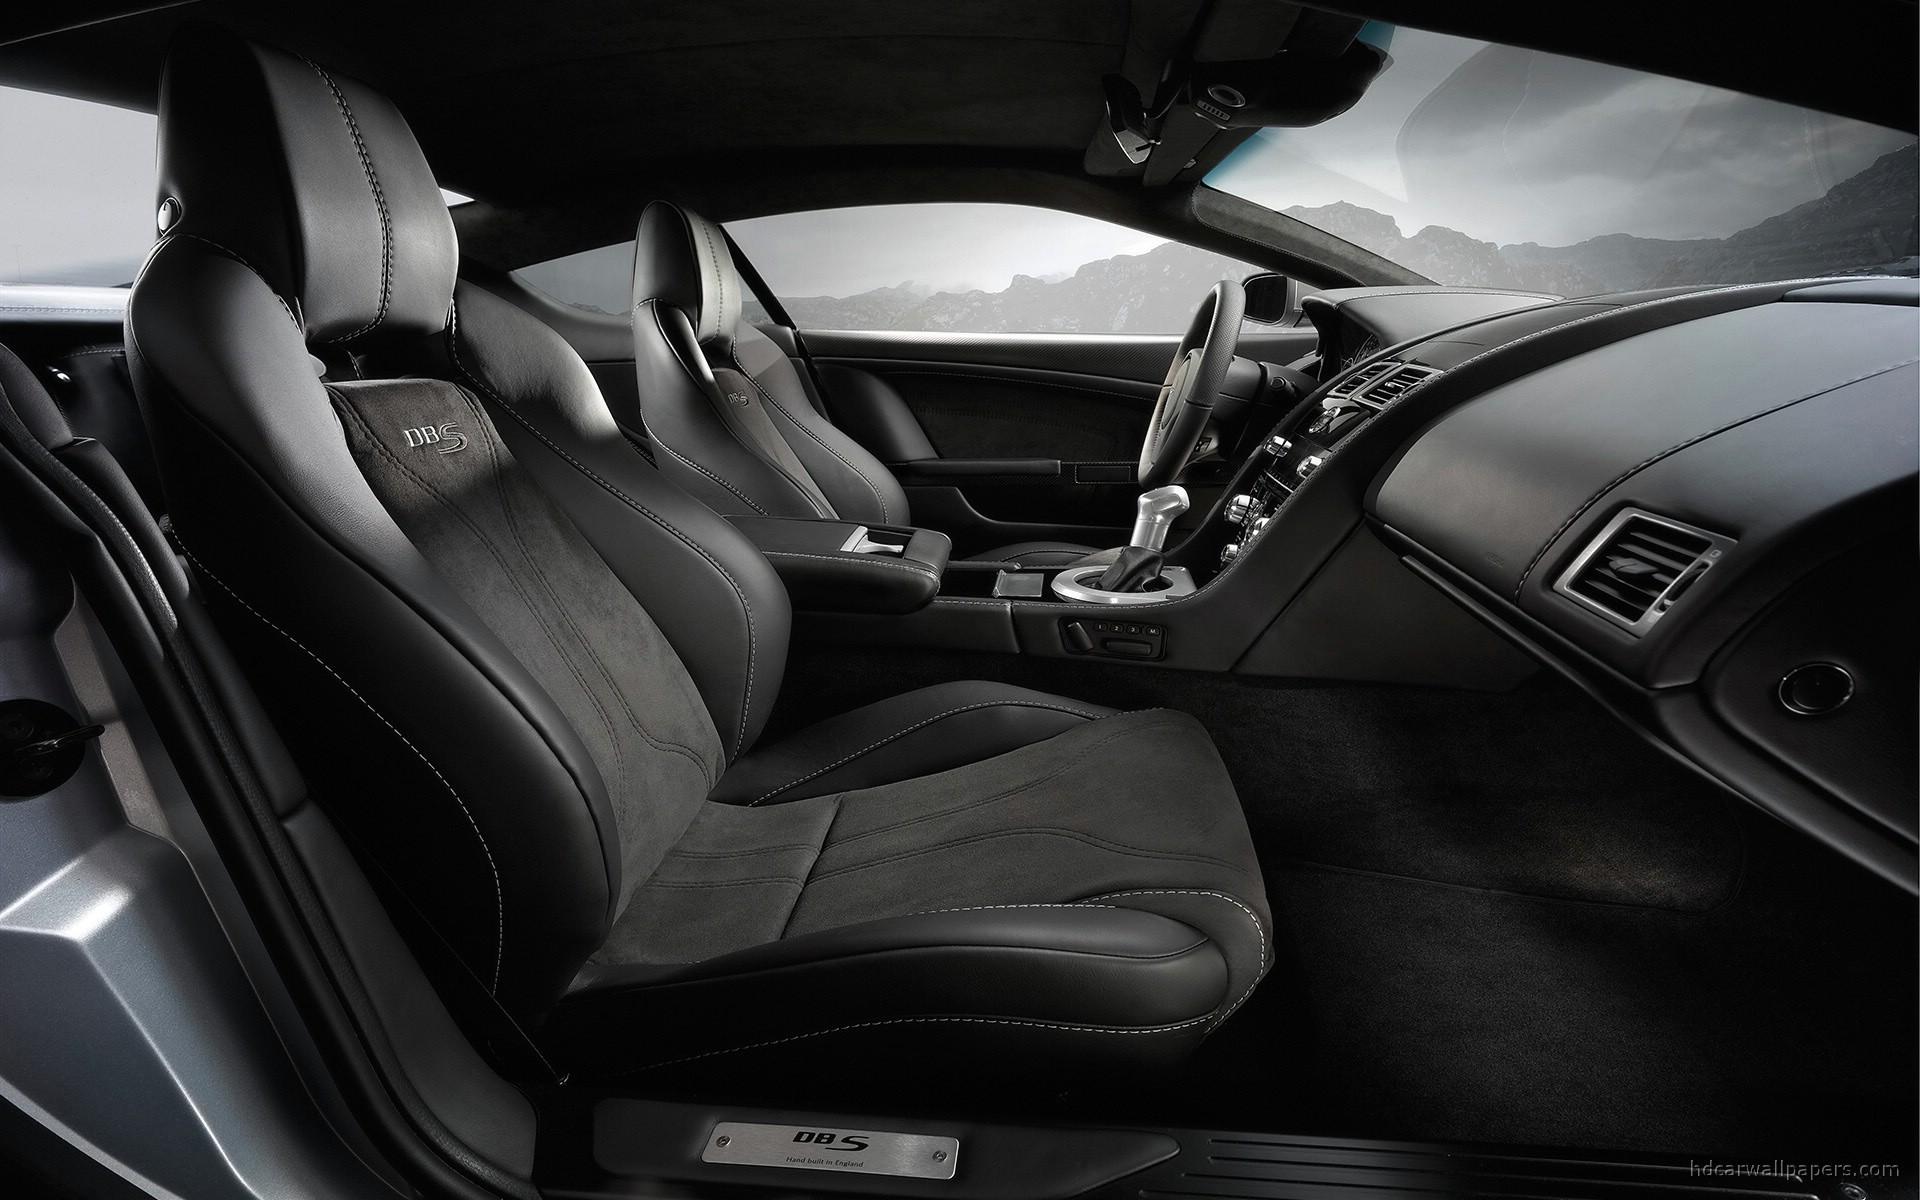 Audi White Car Wallpapers Aston Martin Dbs Interior Wallpaper Hd Car Wallpapers